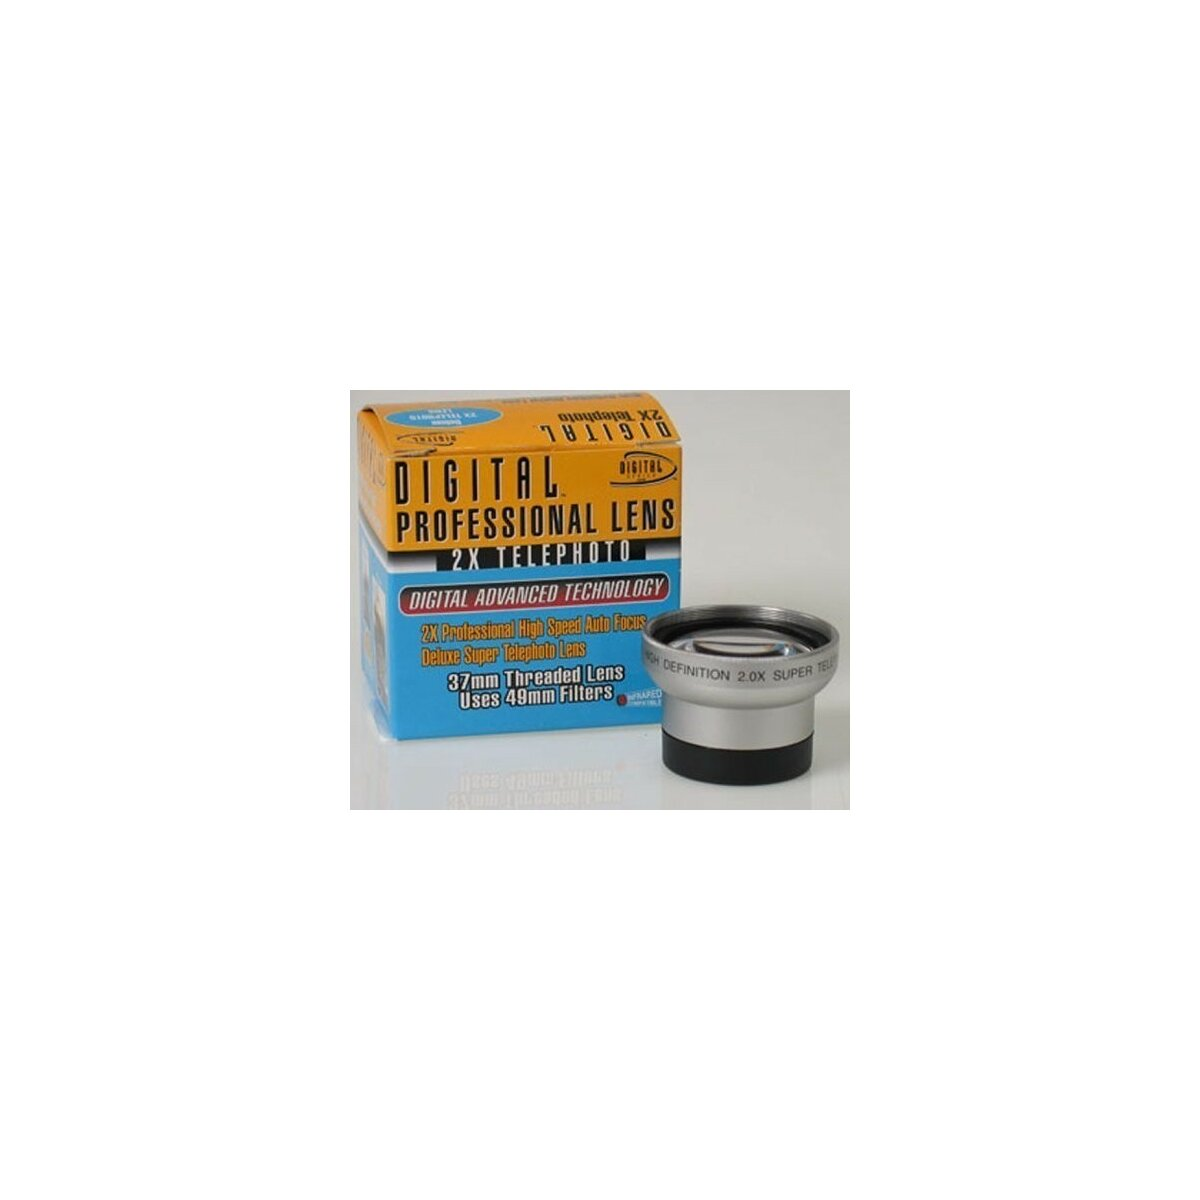 2.0x Telekonverter von Digital Optics fuer Canon MVX10i, MVX30i, Panasonic NV-GS17, JVC GR-D815, Hitachi DZ-HS501 usw.